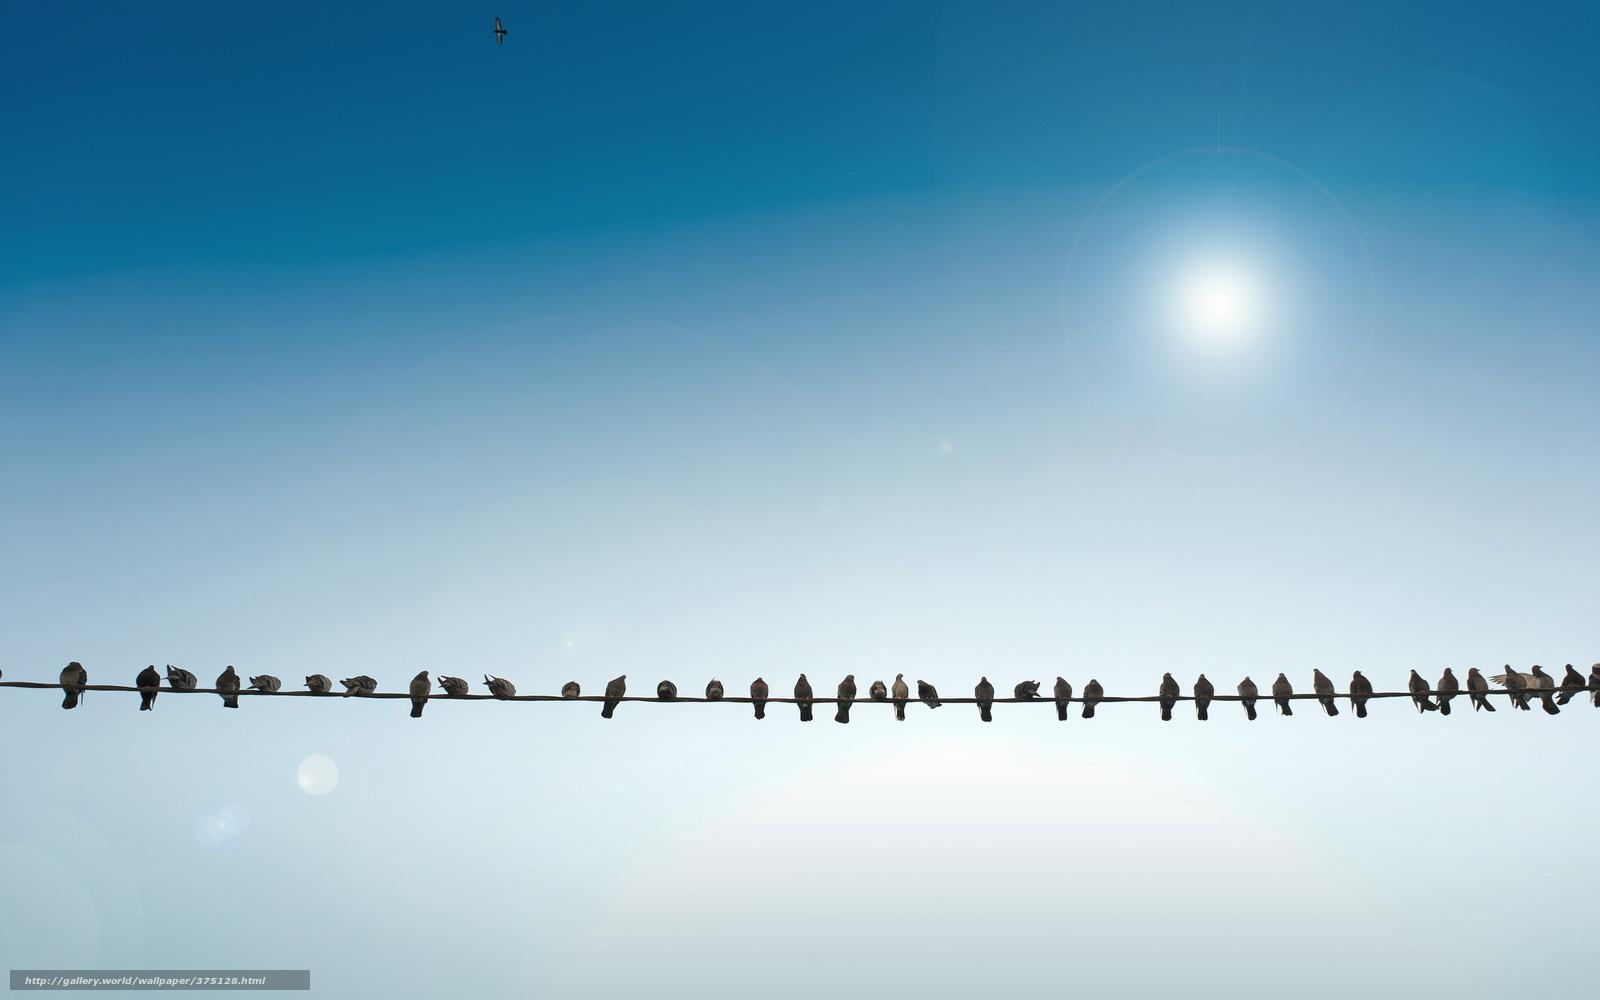 Download wallpaper birds wire sky free desktop wallpaper - Wallpaper picture ...